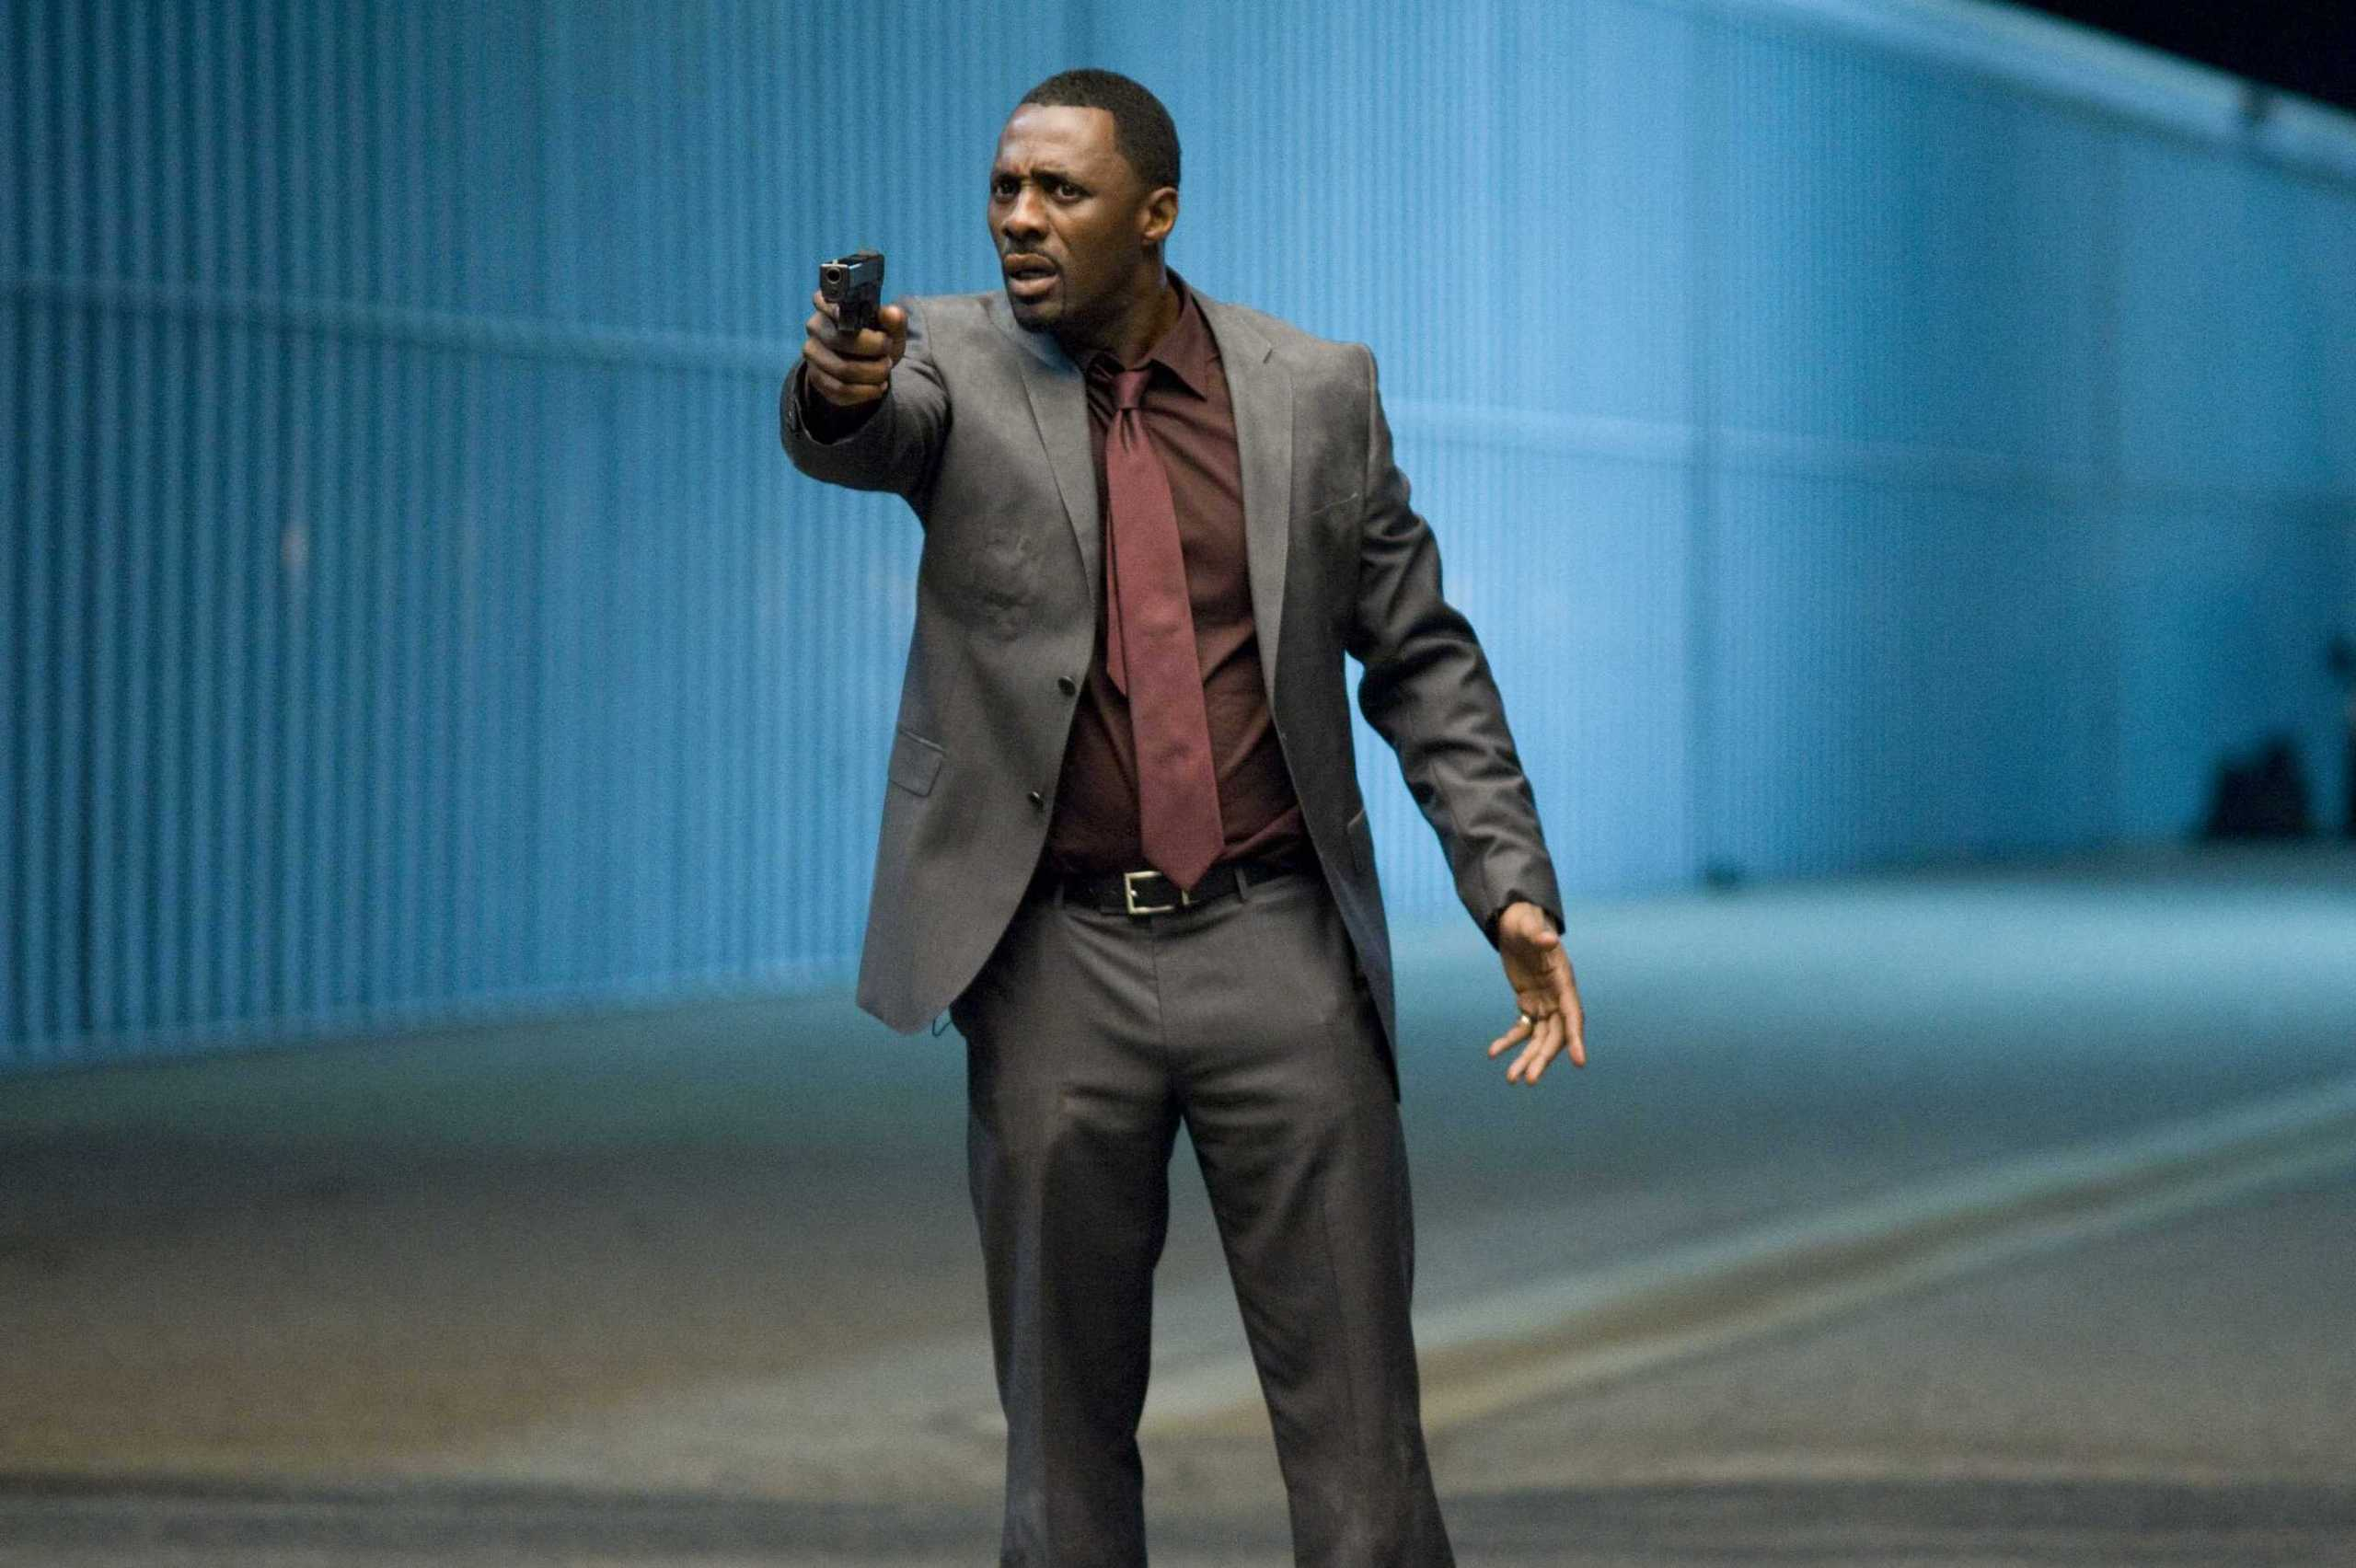 Images of Idris Elba Takers - #SpaceHero